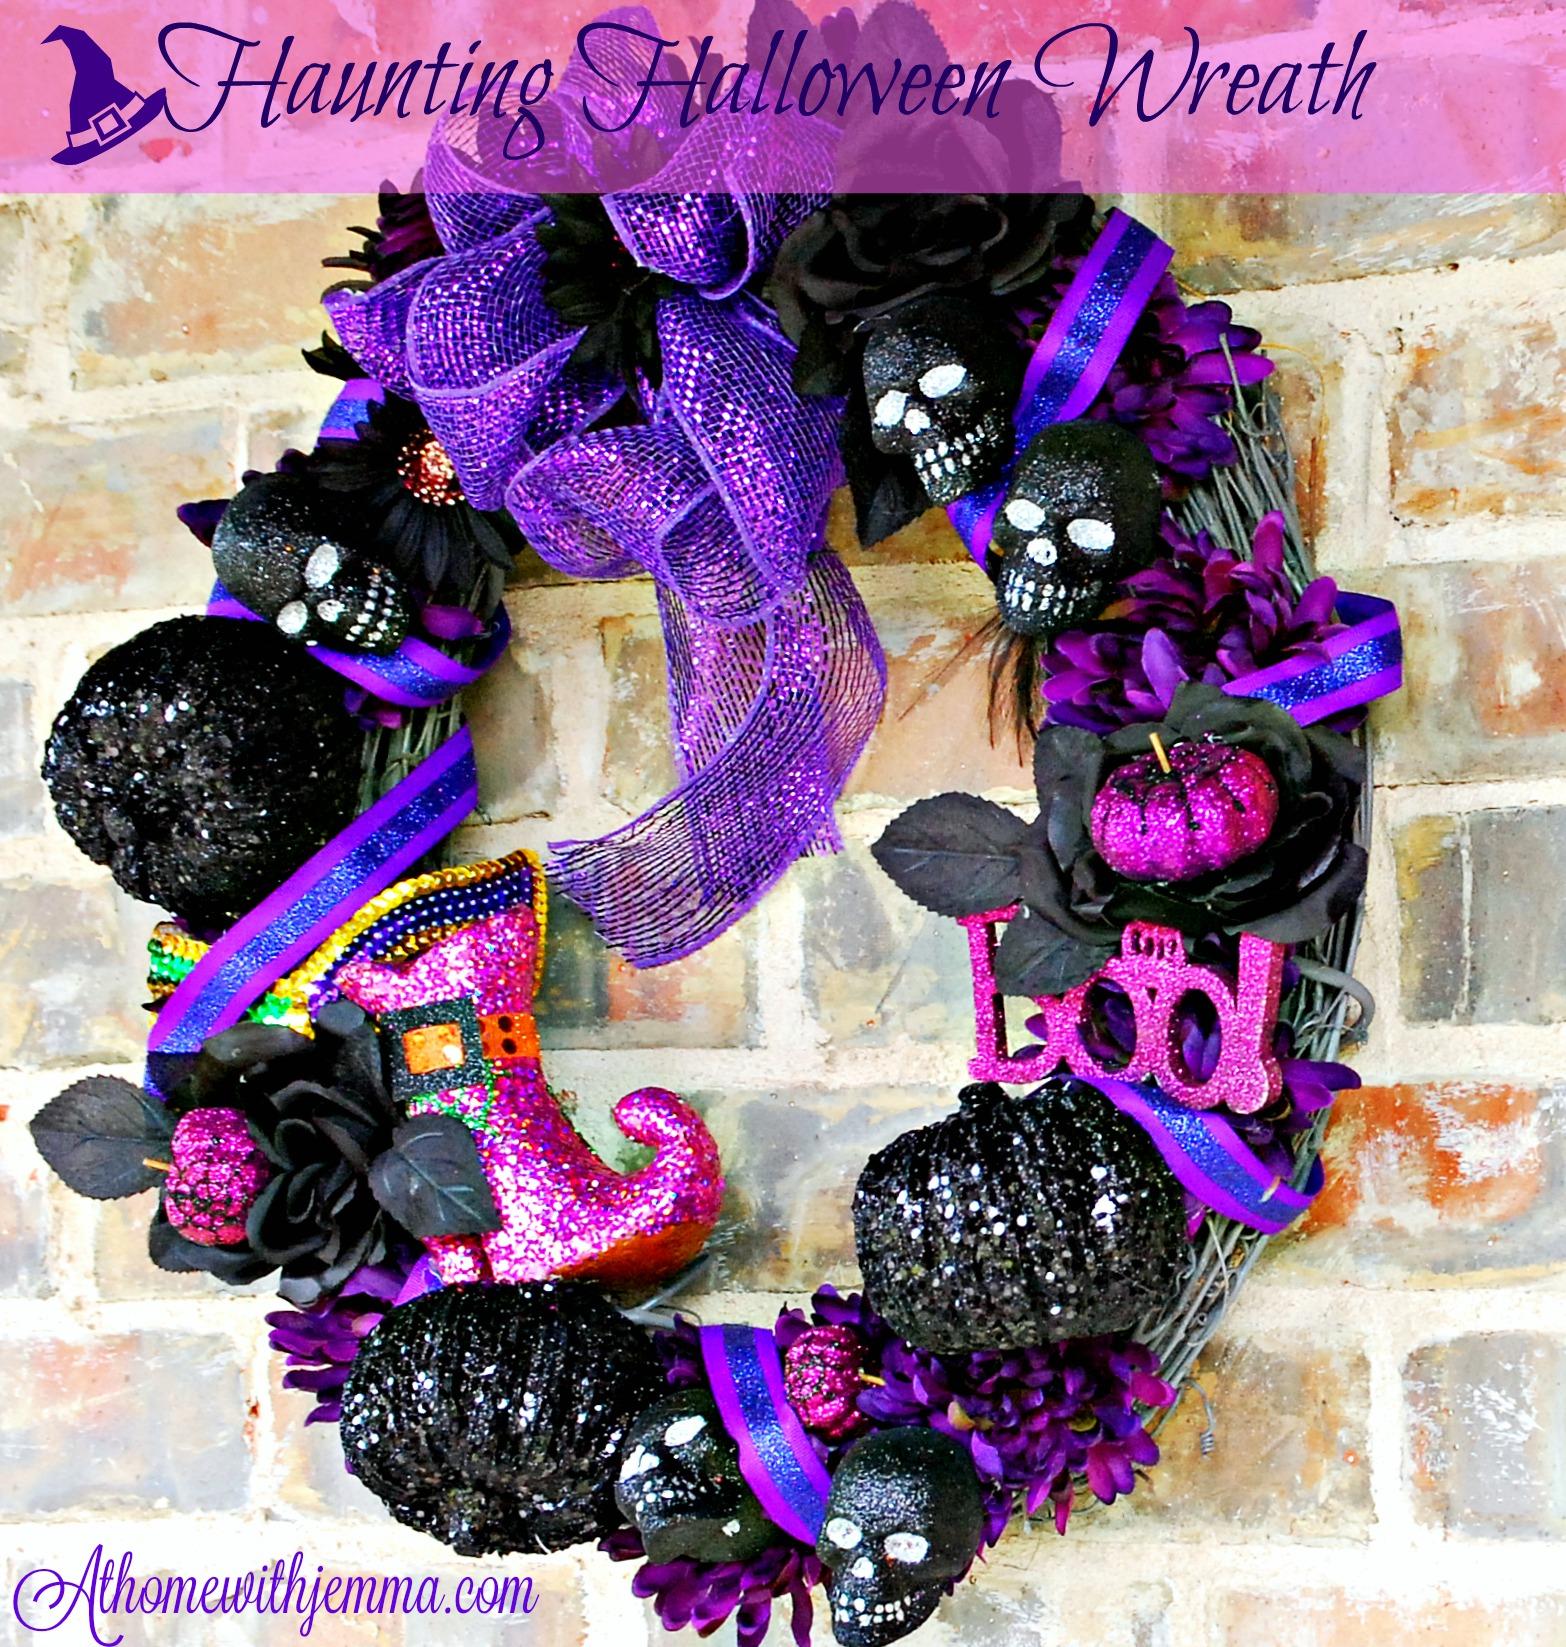 purple, black, skulls, mums on a grapevine wreath, athomewithjemma